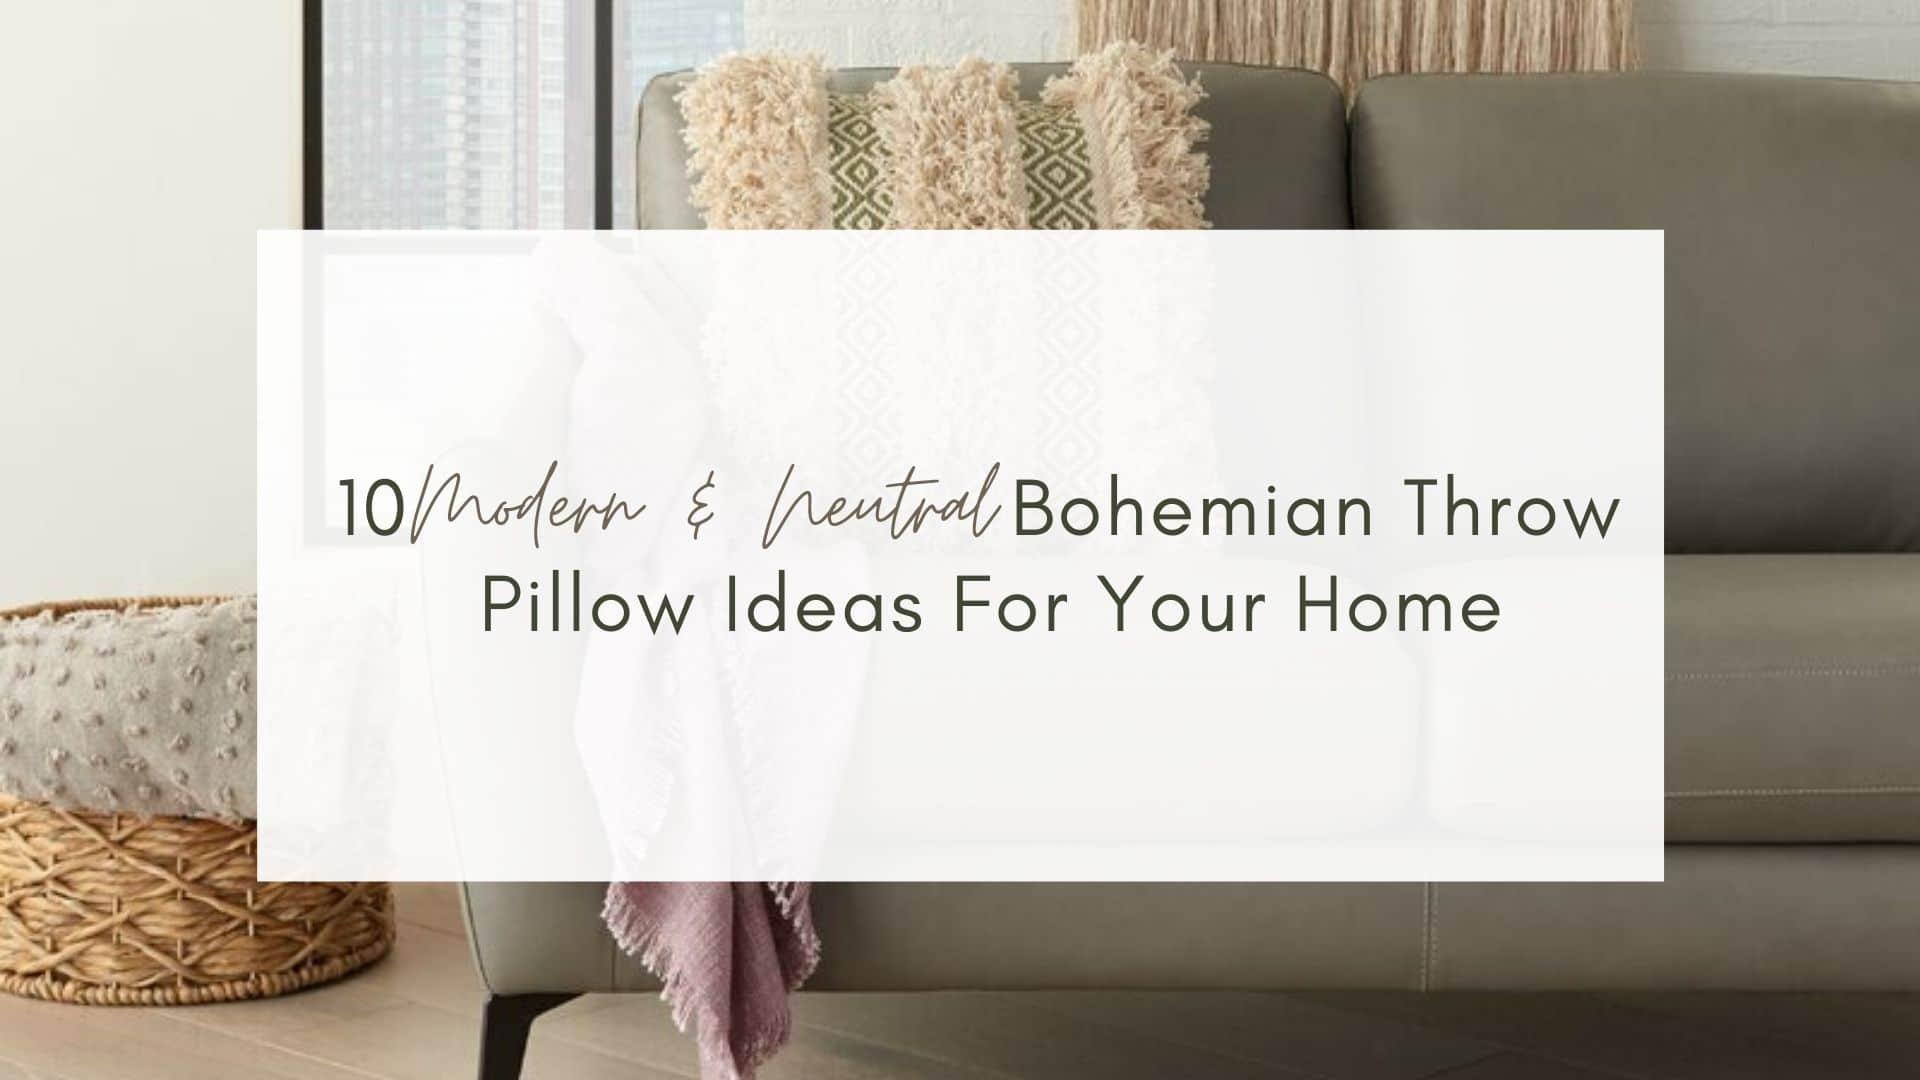 10 Modern Neutral Bohemian Throw Pillow Ideas For Your Home